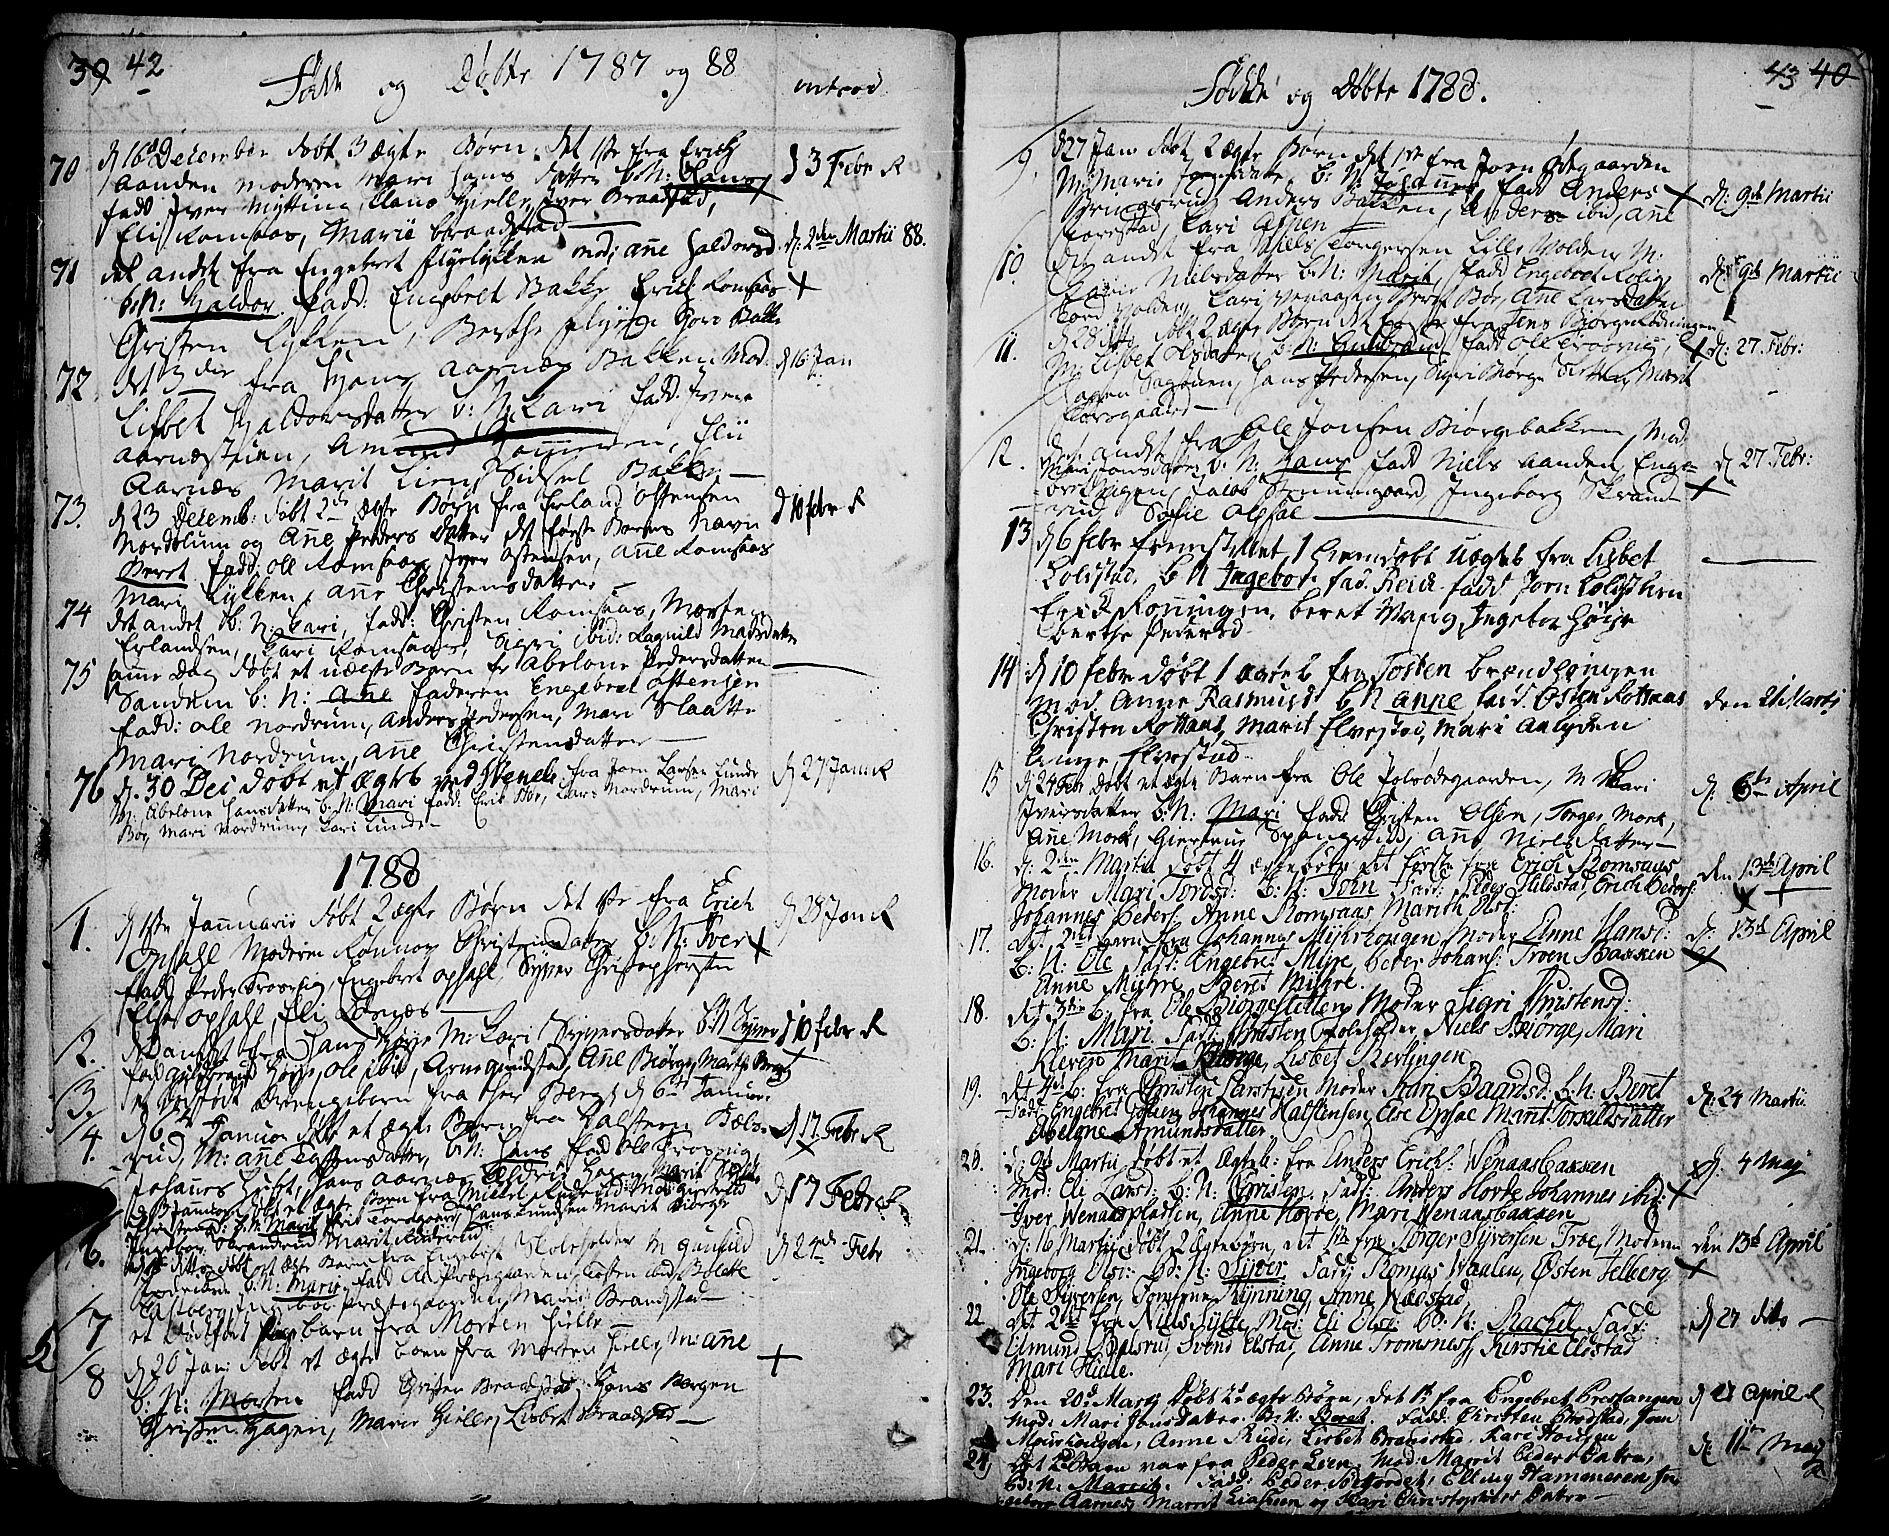 SAH, Ringebu prestekontor, Ministerialbok nr. 3, 1781-1820, s. 42-43